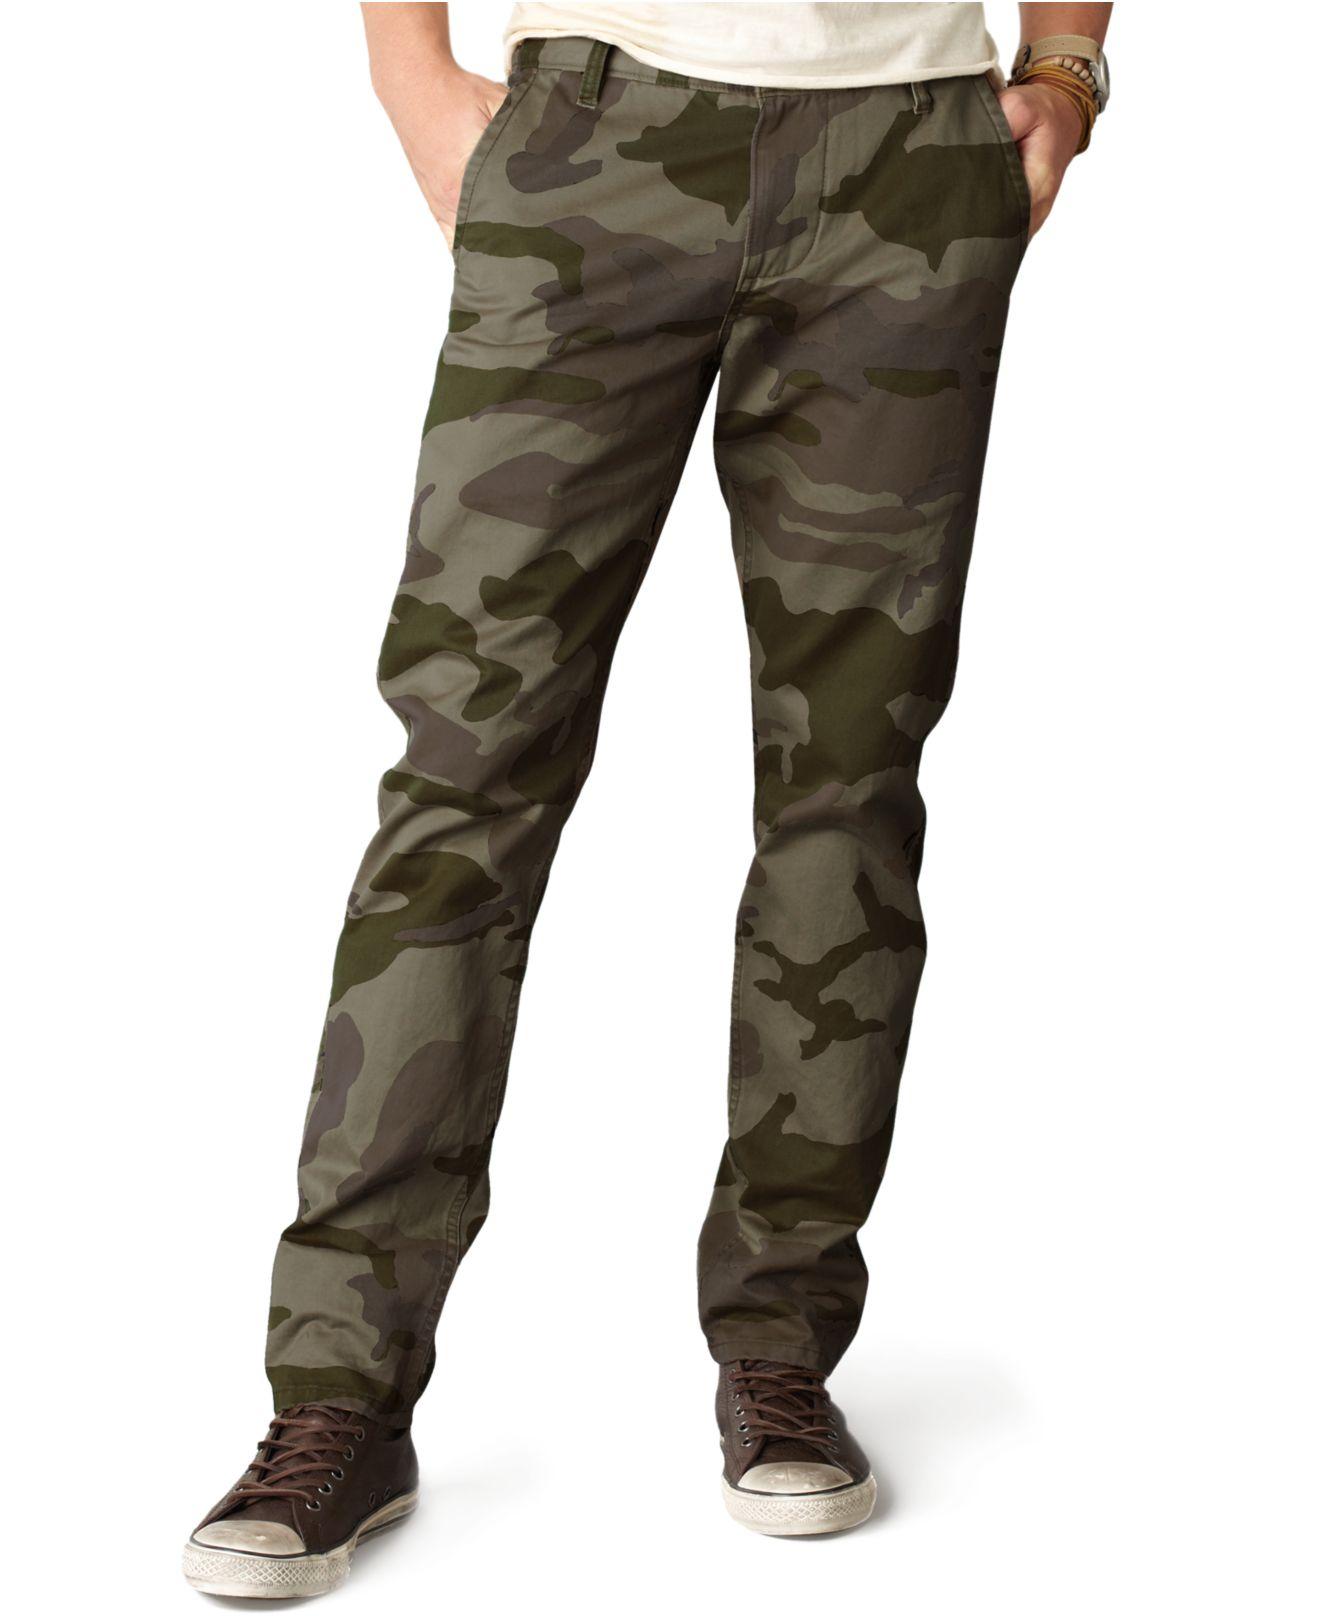 Lyst Dockers Slim Fit Alpha Khaki Camo Flat Front Pants